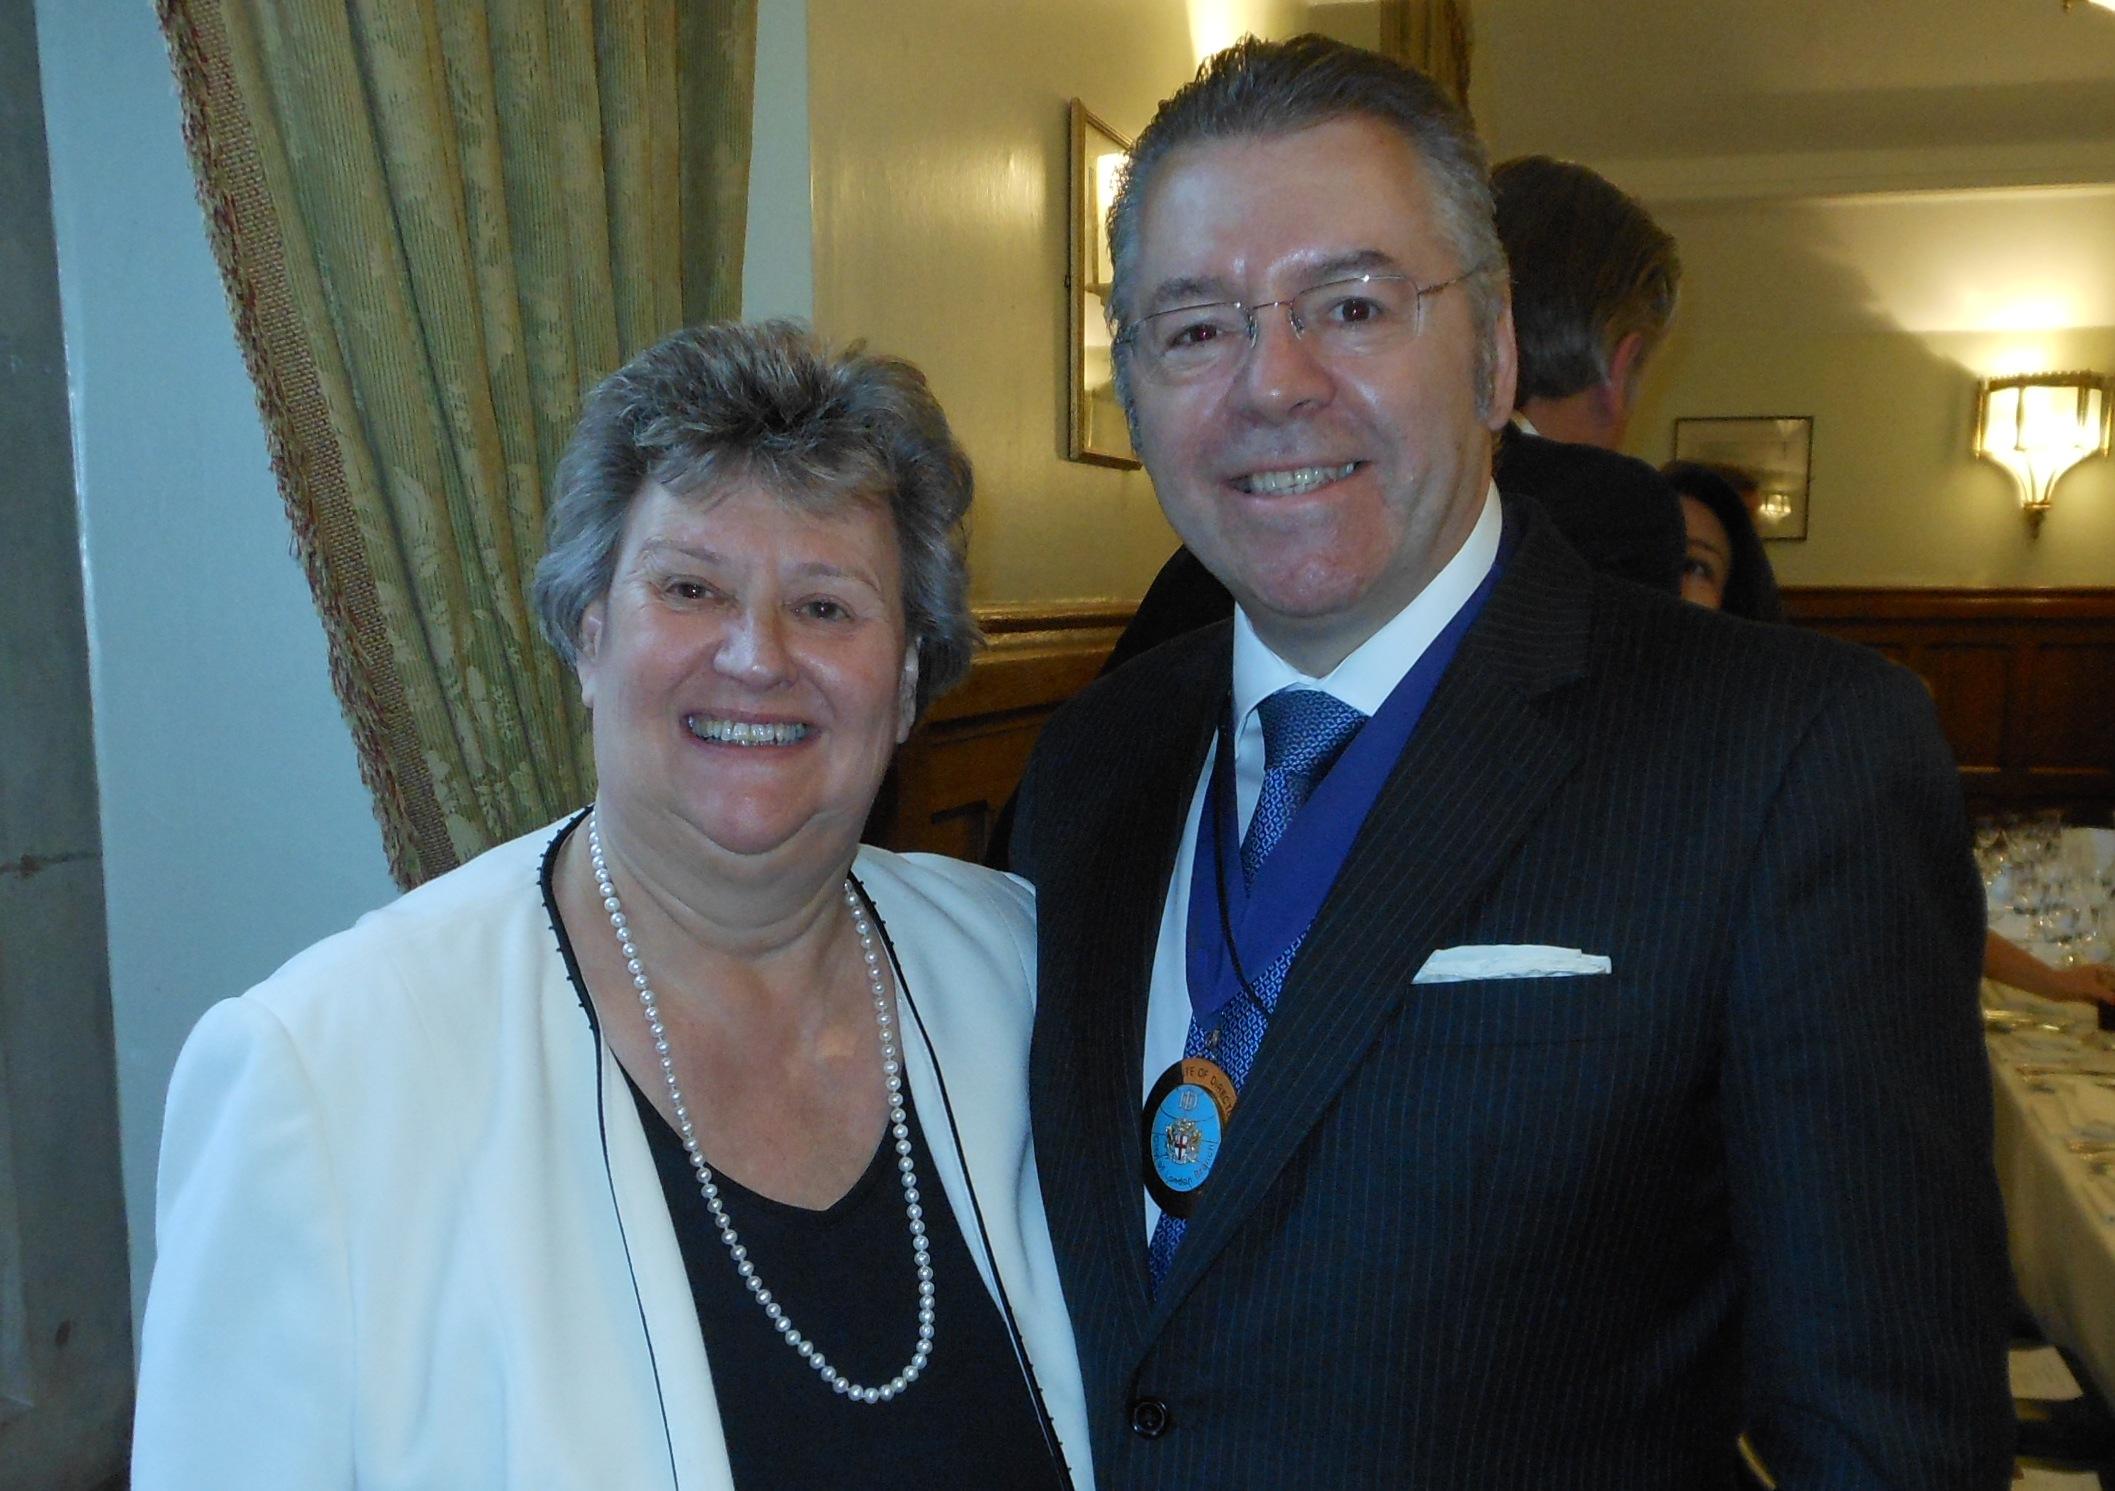 Heather Wheeler MP, Vice Chairman APPCG & David Stringer-Lamarre